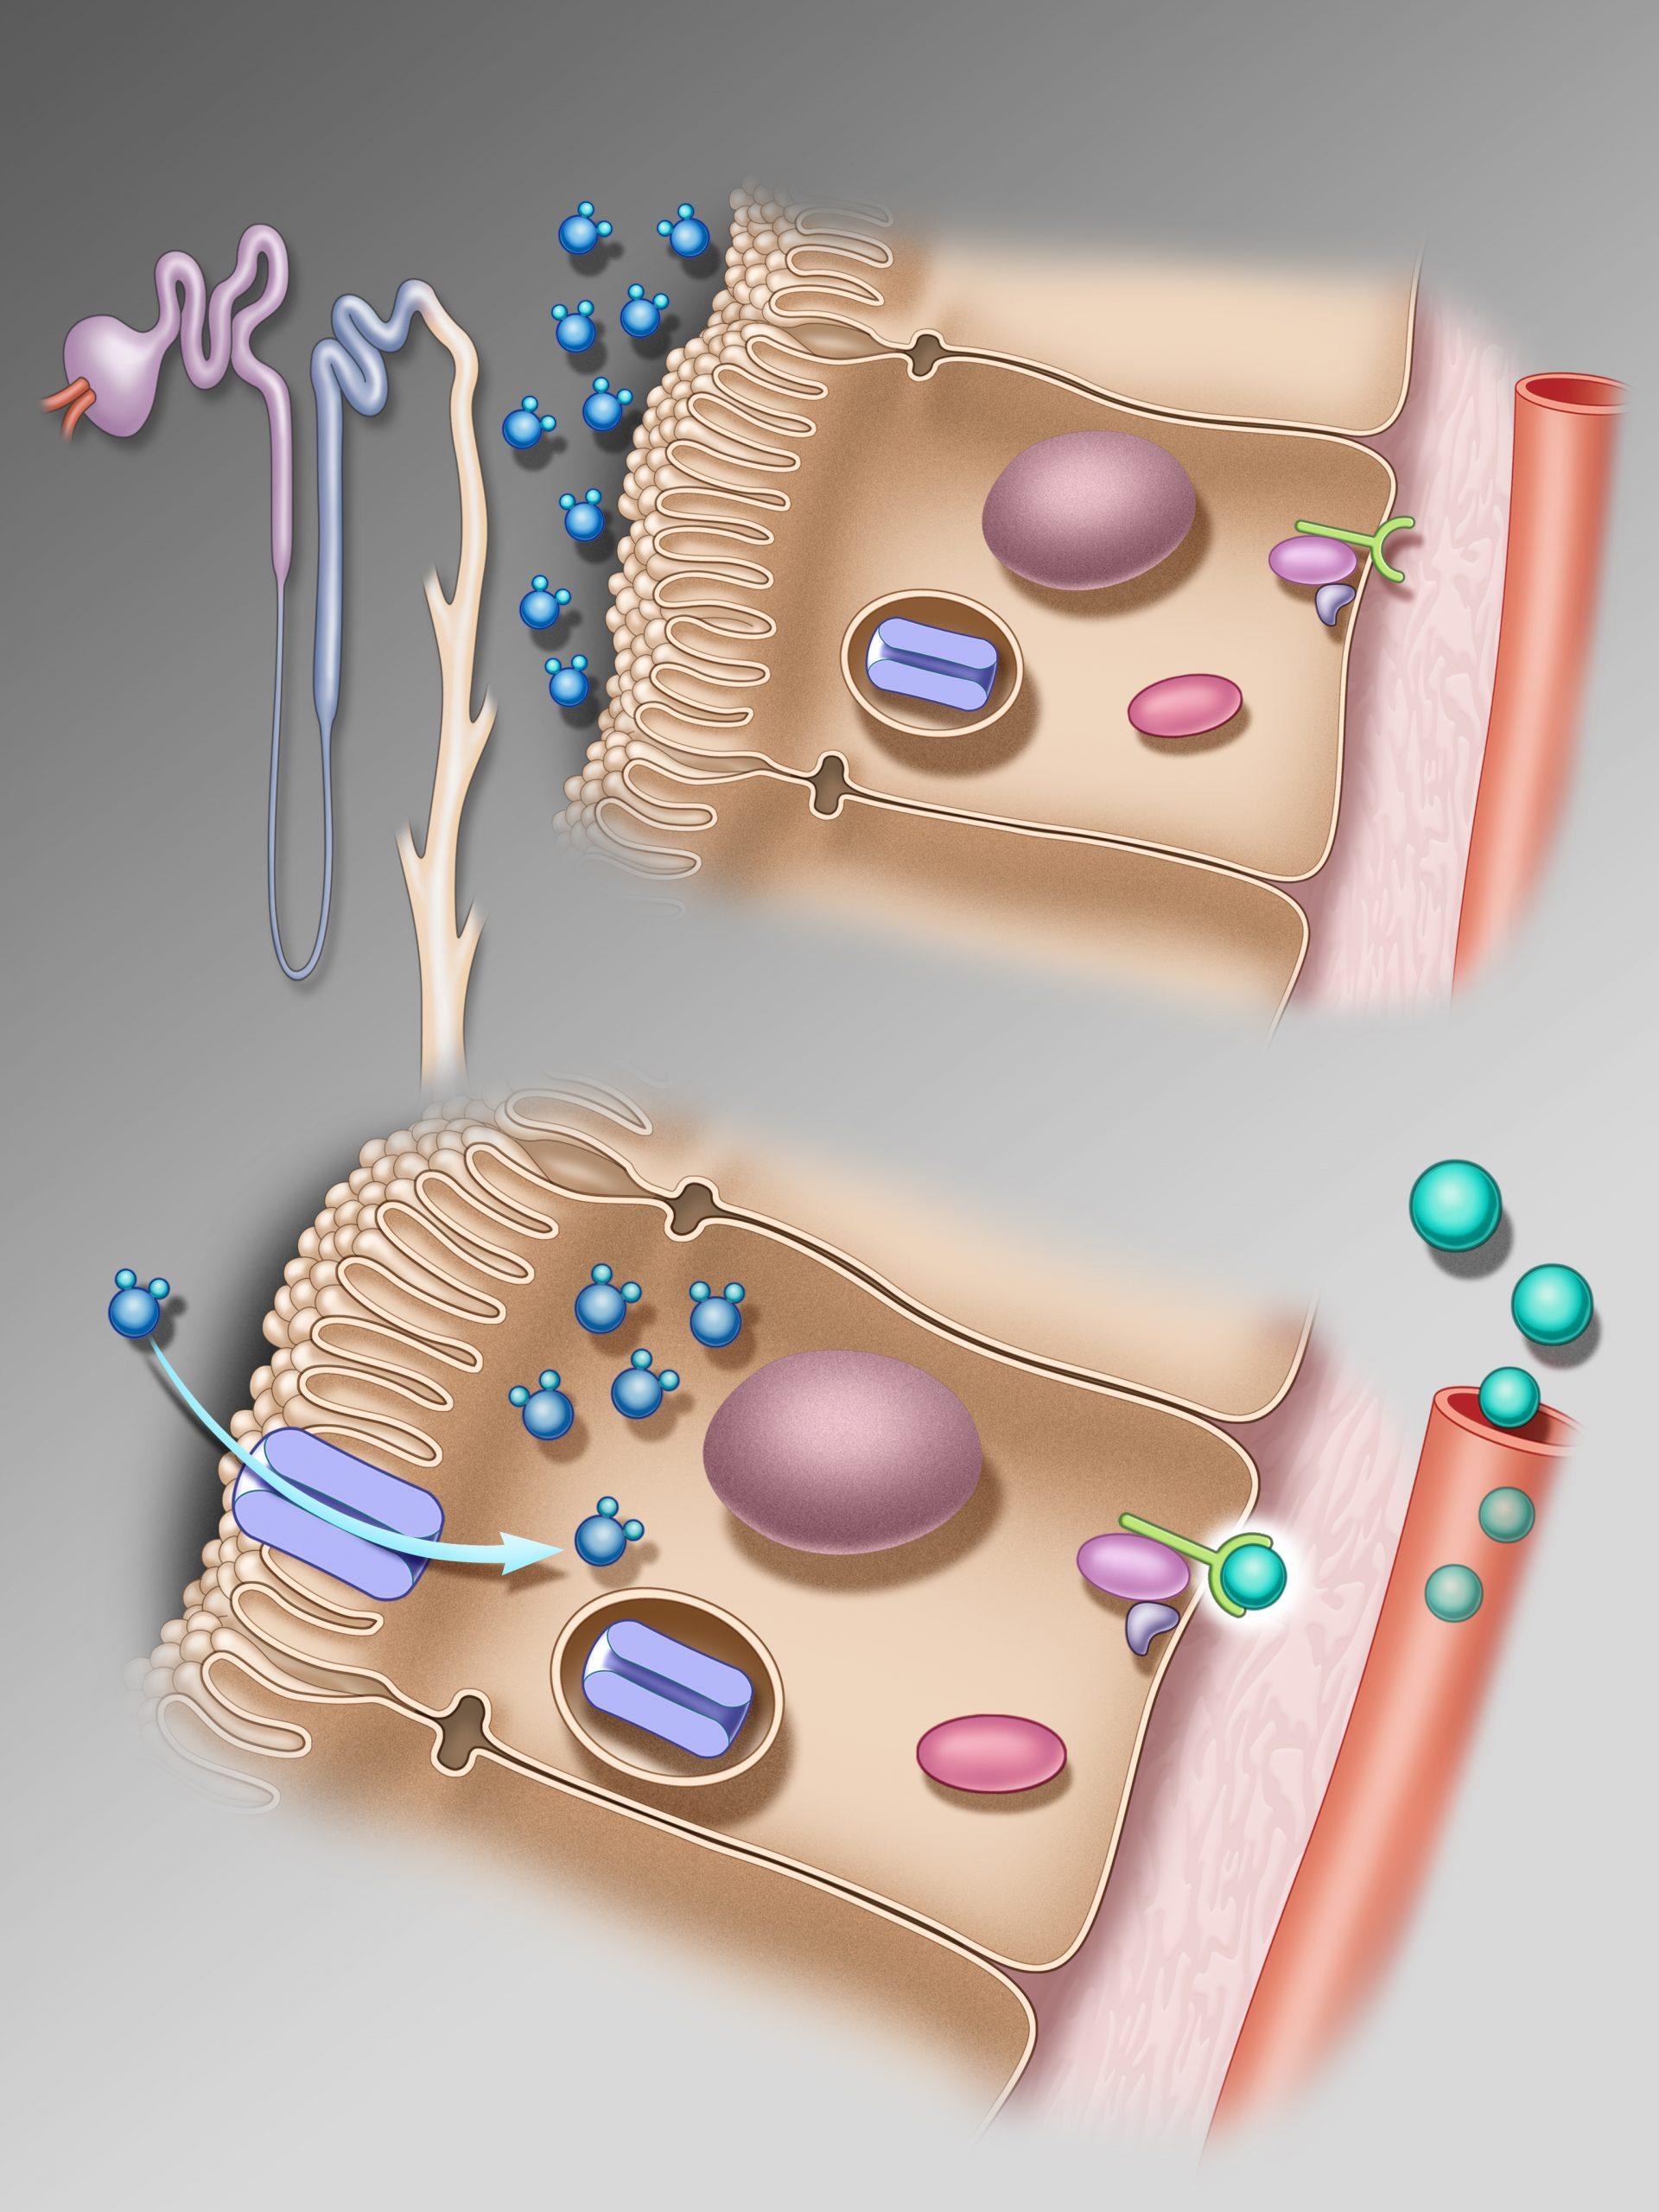 Cellular Processes behind Nocturia